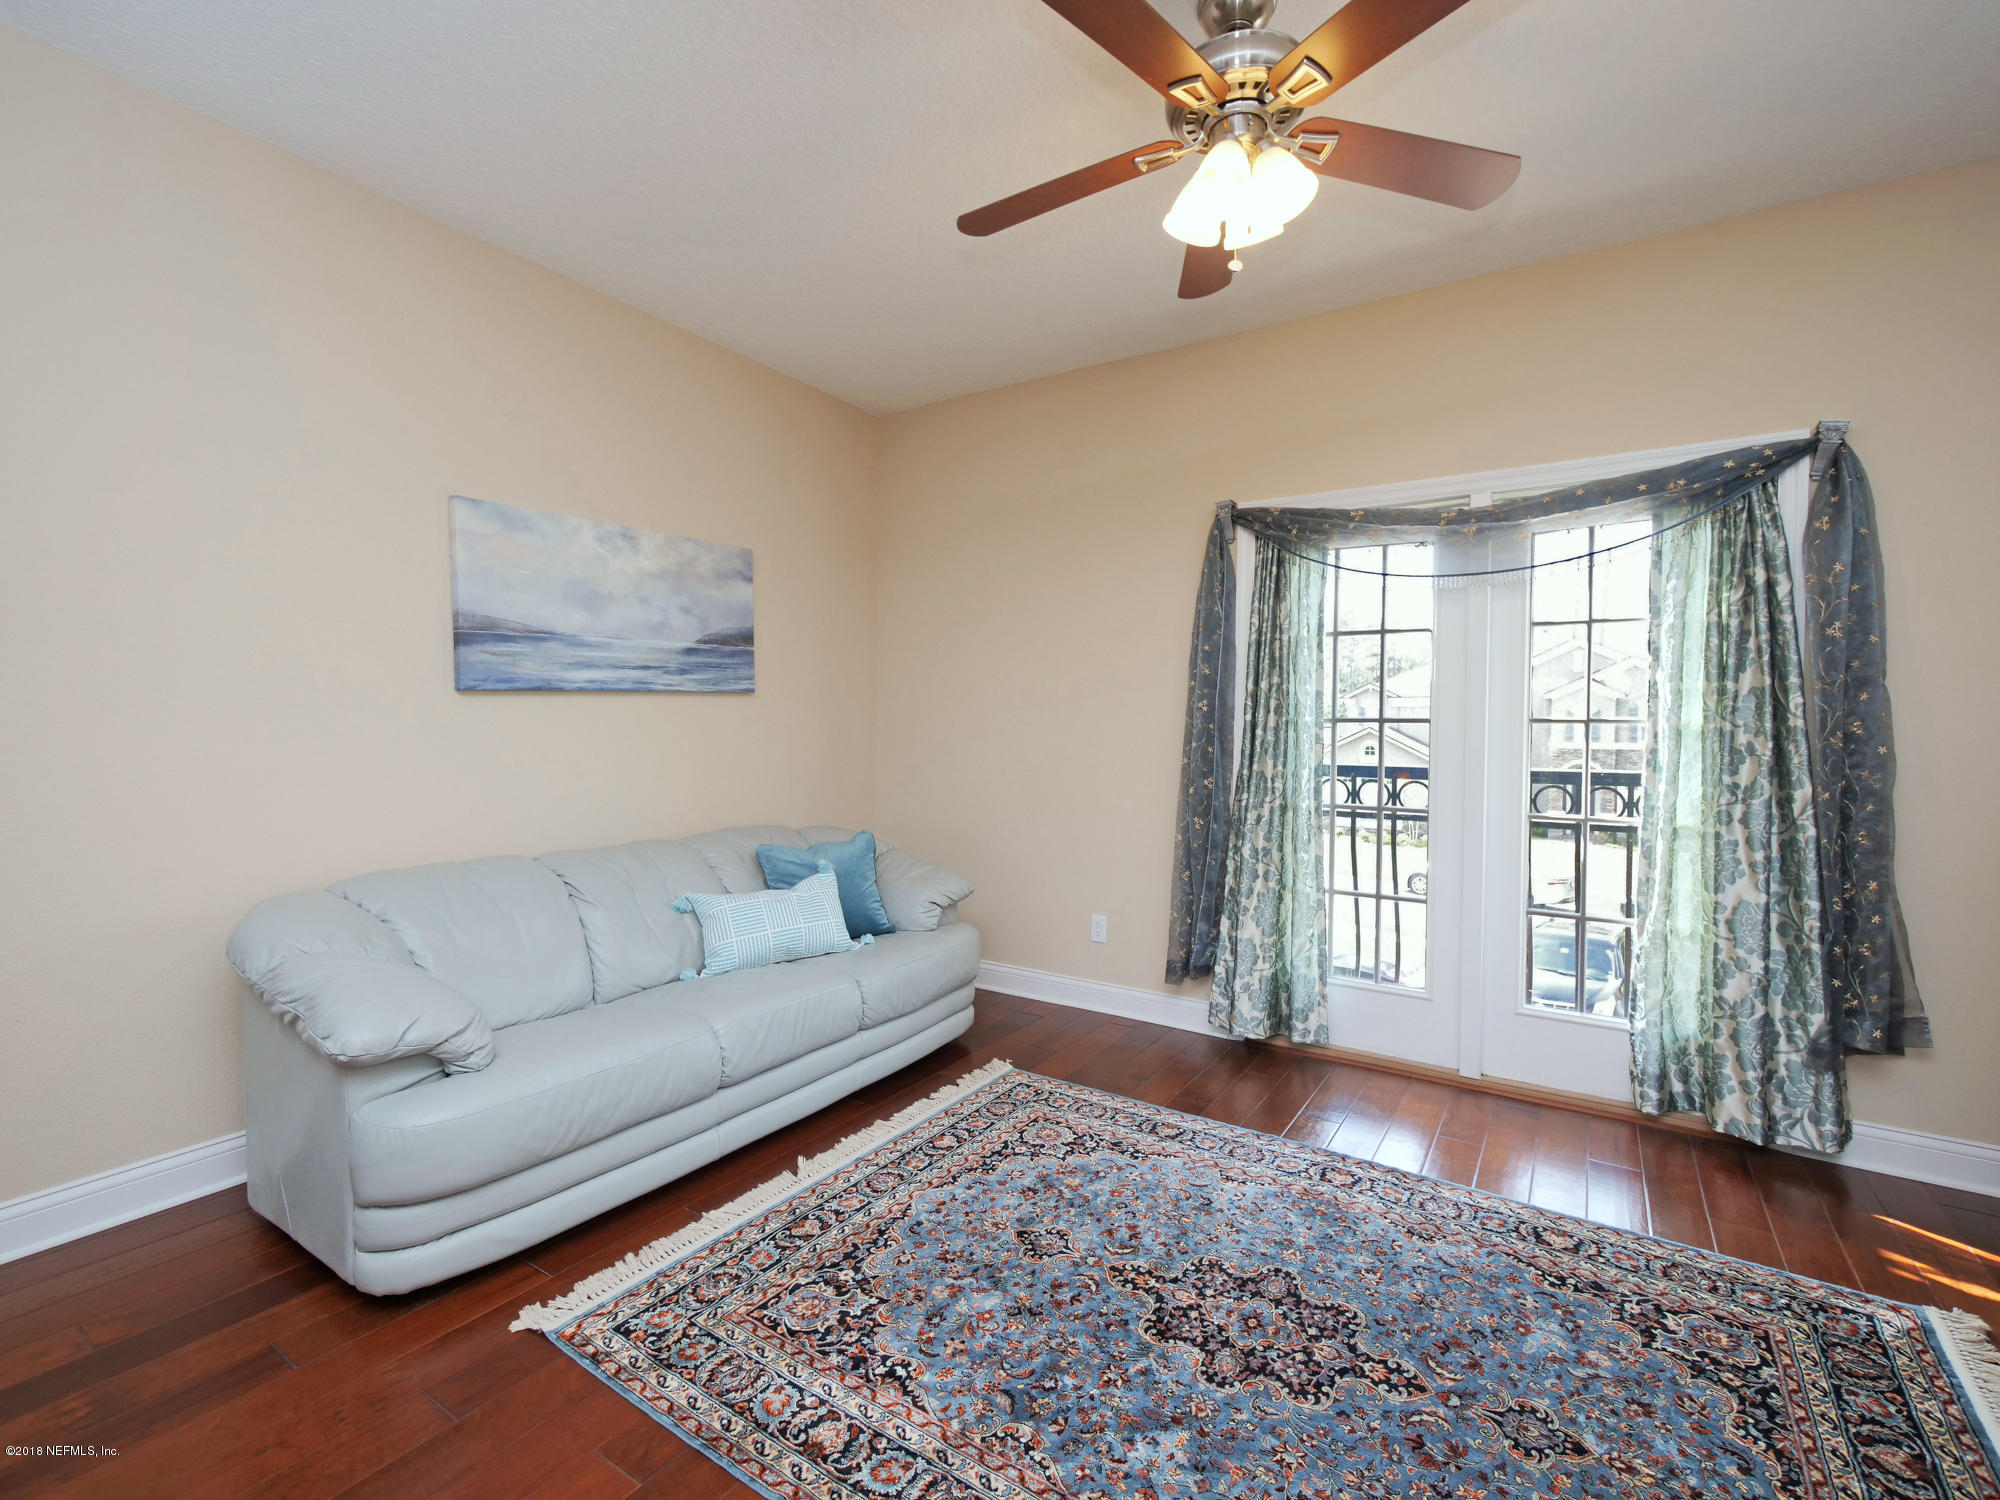 287 PAYASADA, PONTE VEDRA BEACH, FLORIDA 32082, 6 Bedrooms Bedrooms, ,4 BathroomsBathrooms,Residential - single family,For sale,PAYASADA,923989